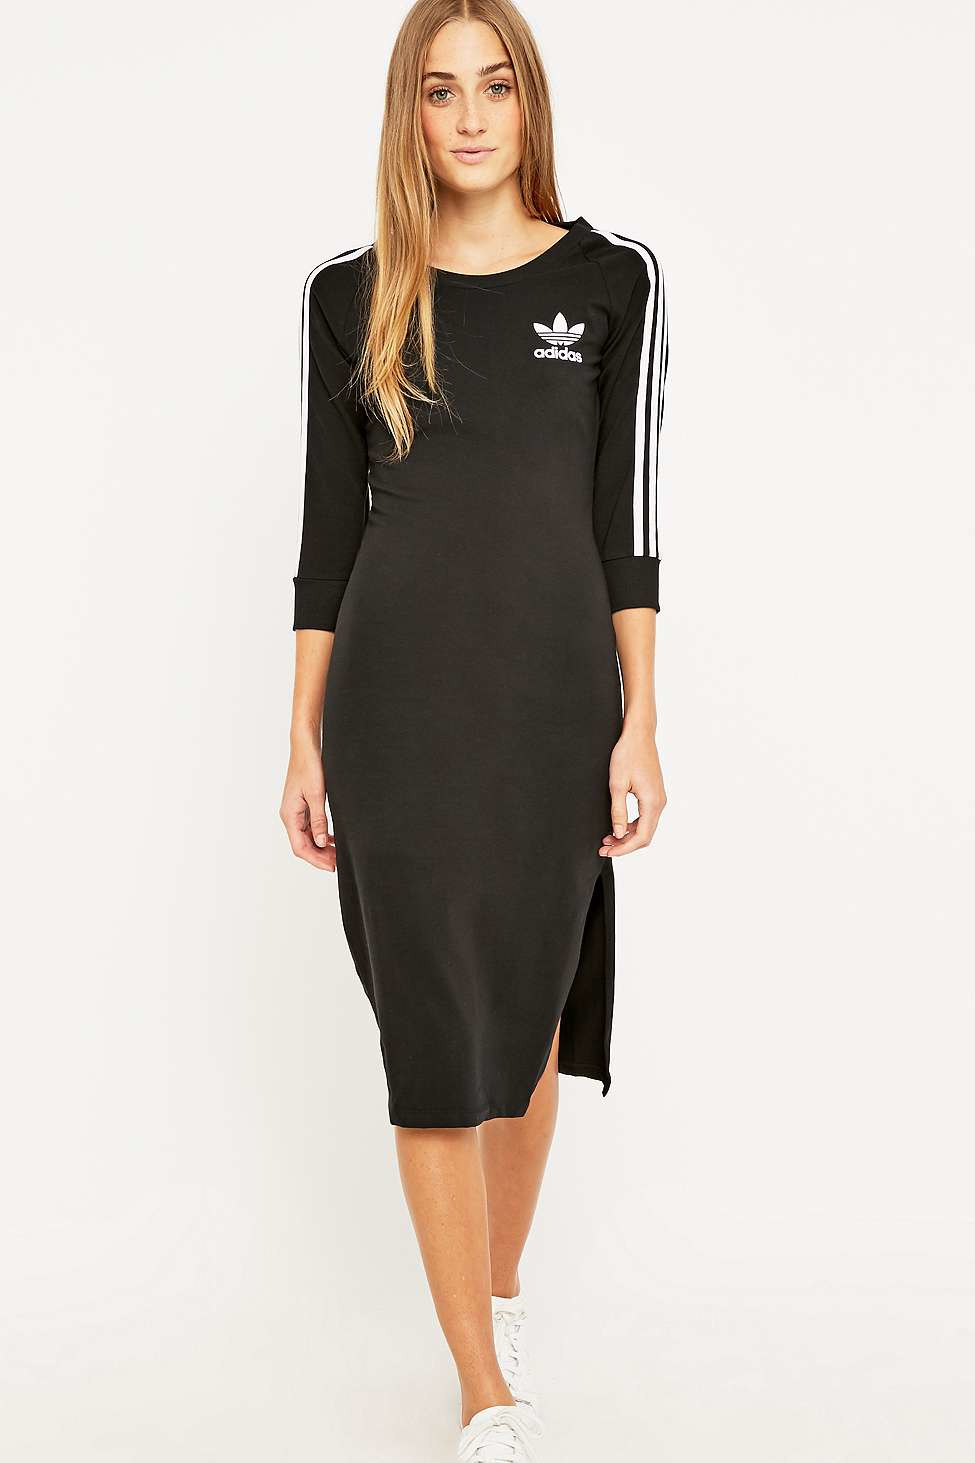 Adidas Originals Kleid Adidas Originals 3 Stripes Kleid